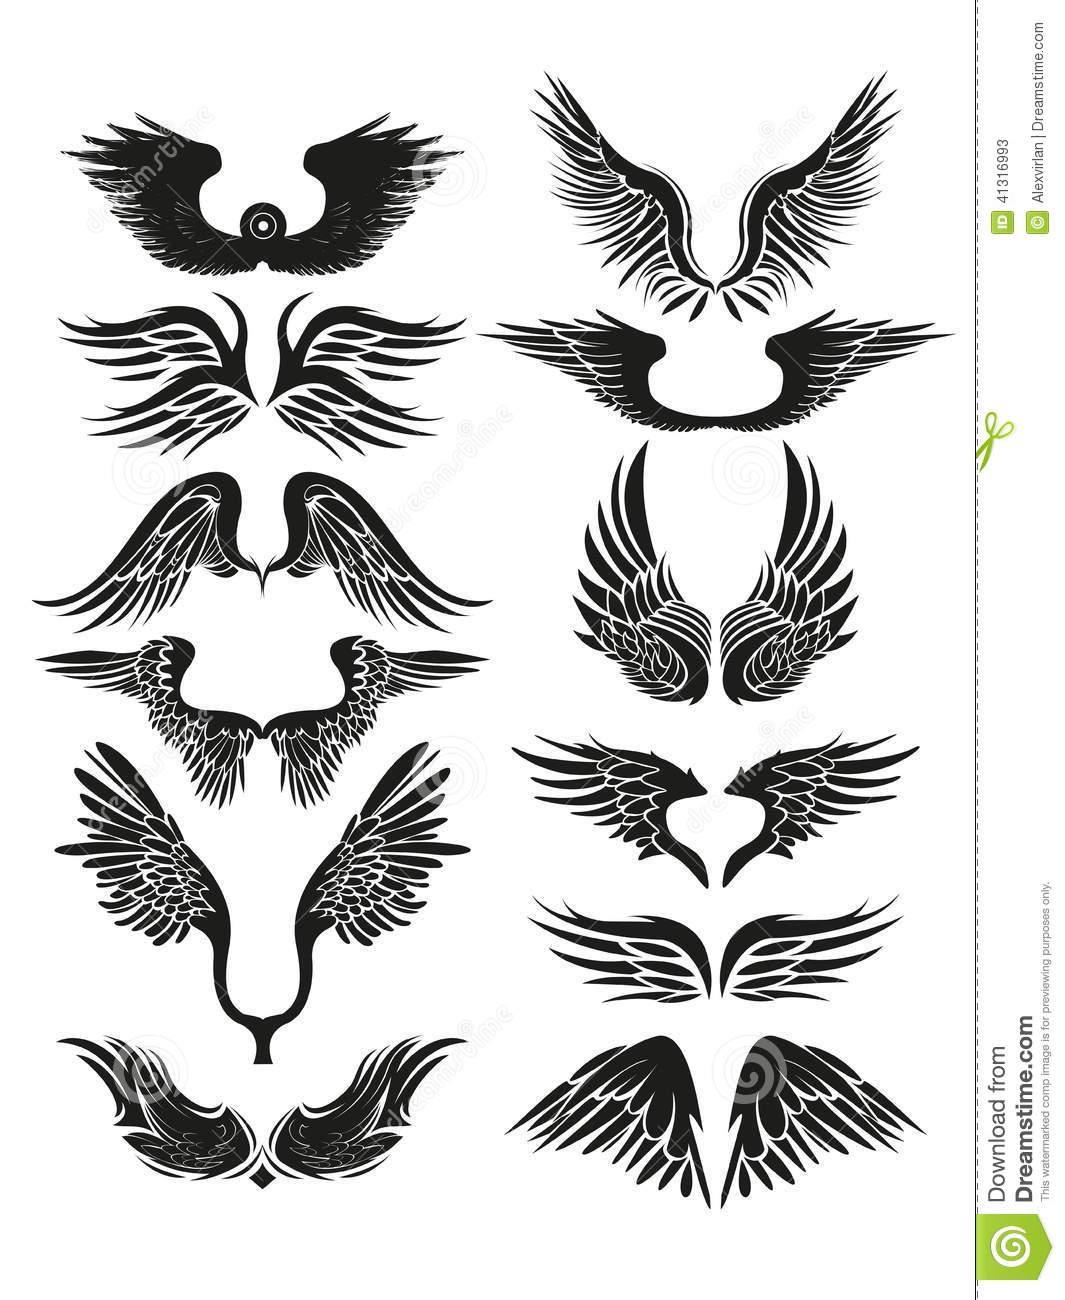 7 Tribal Wings Vector Images - Wings Vector Art Free ...